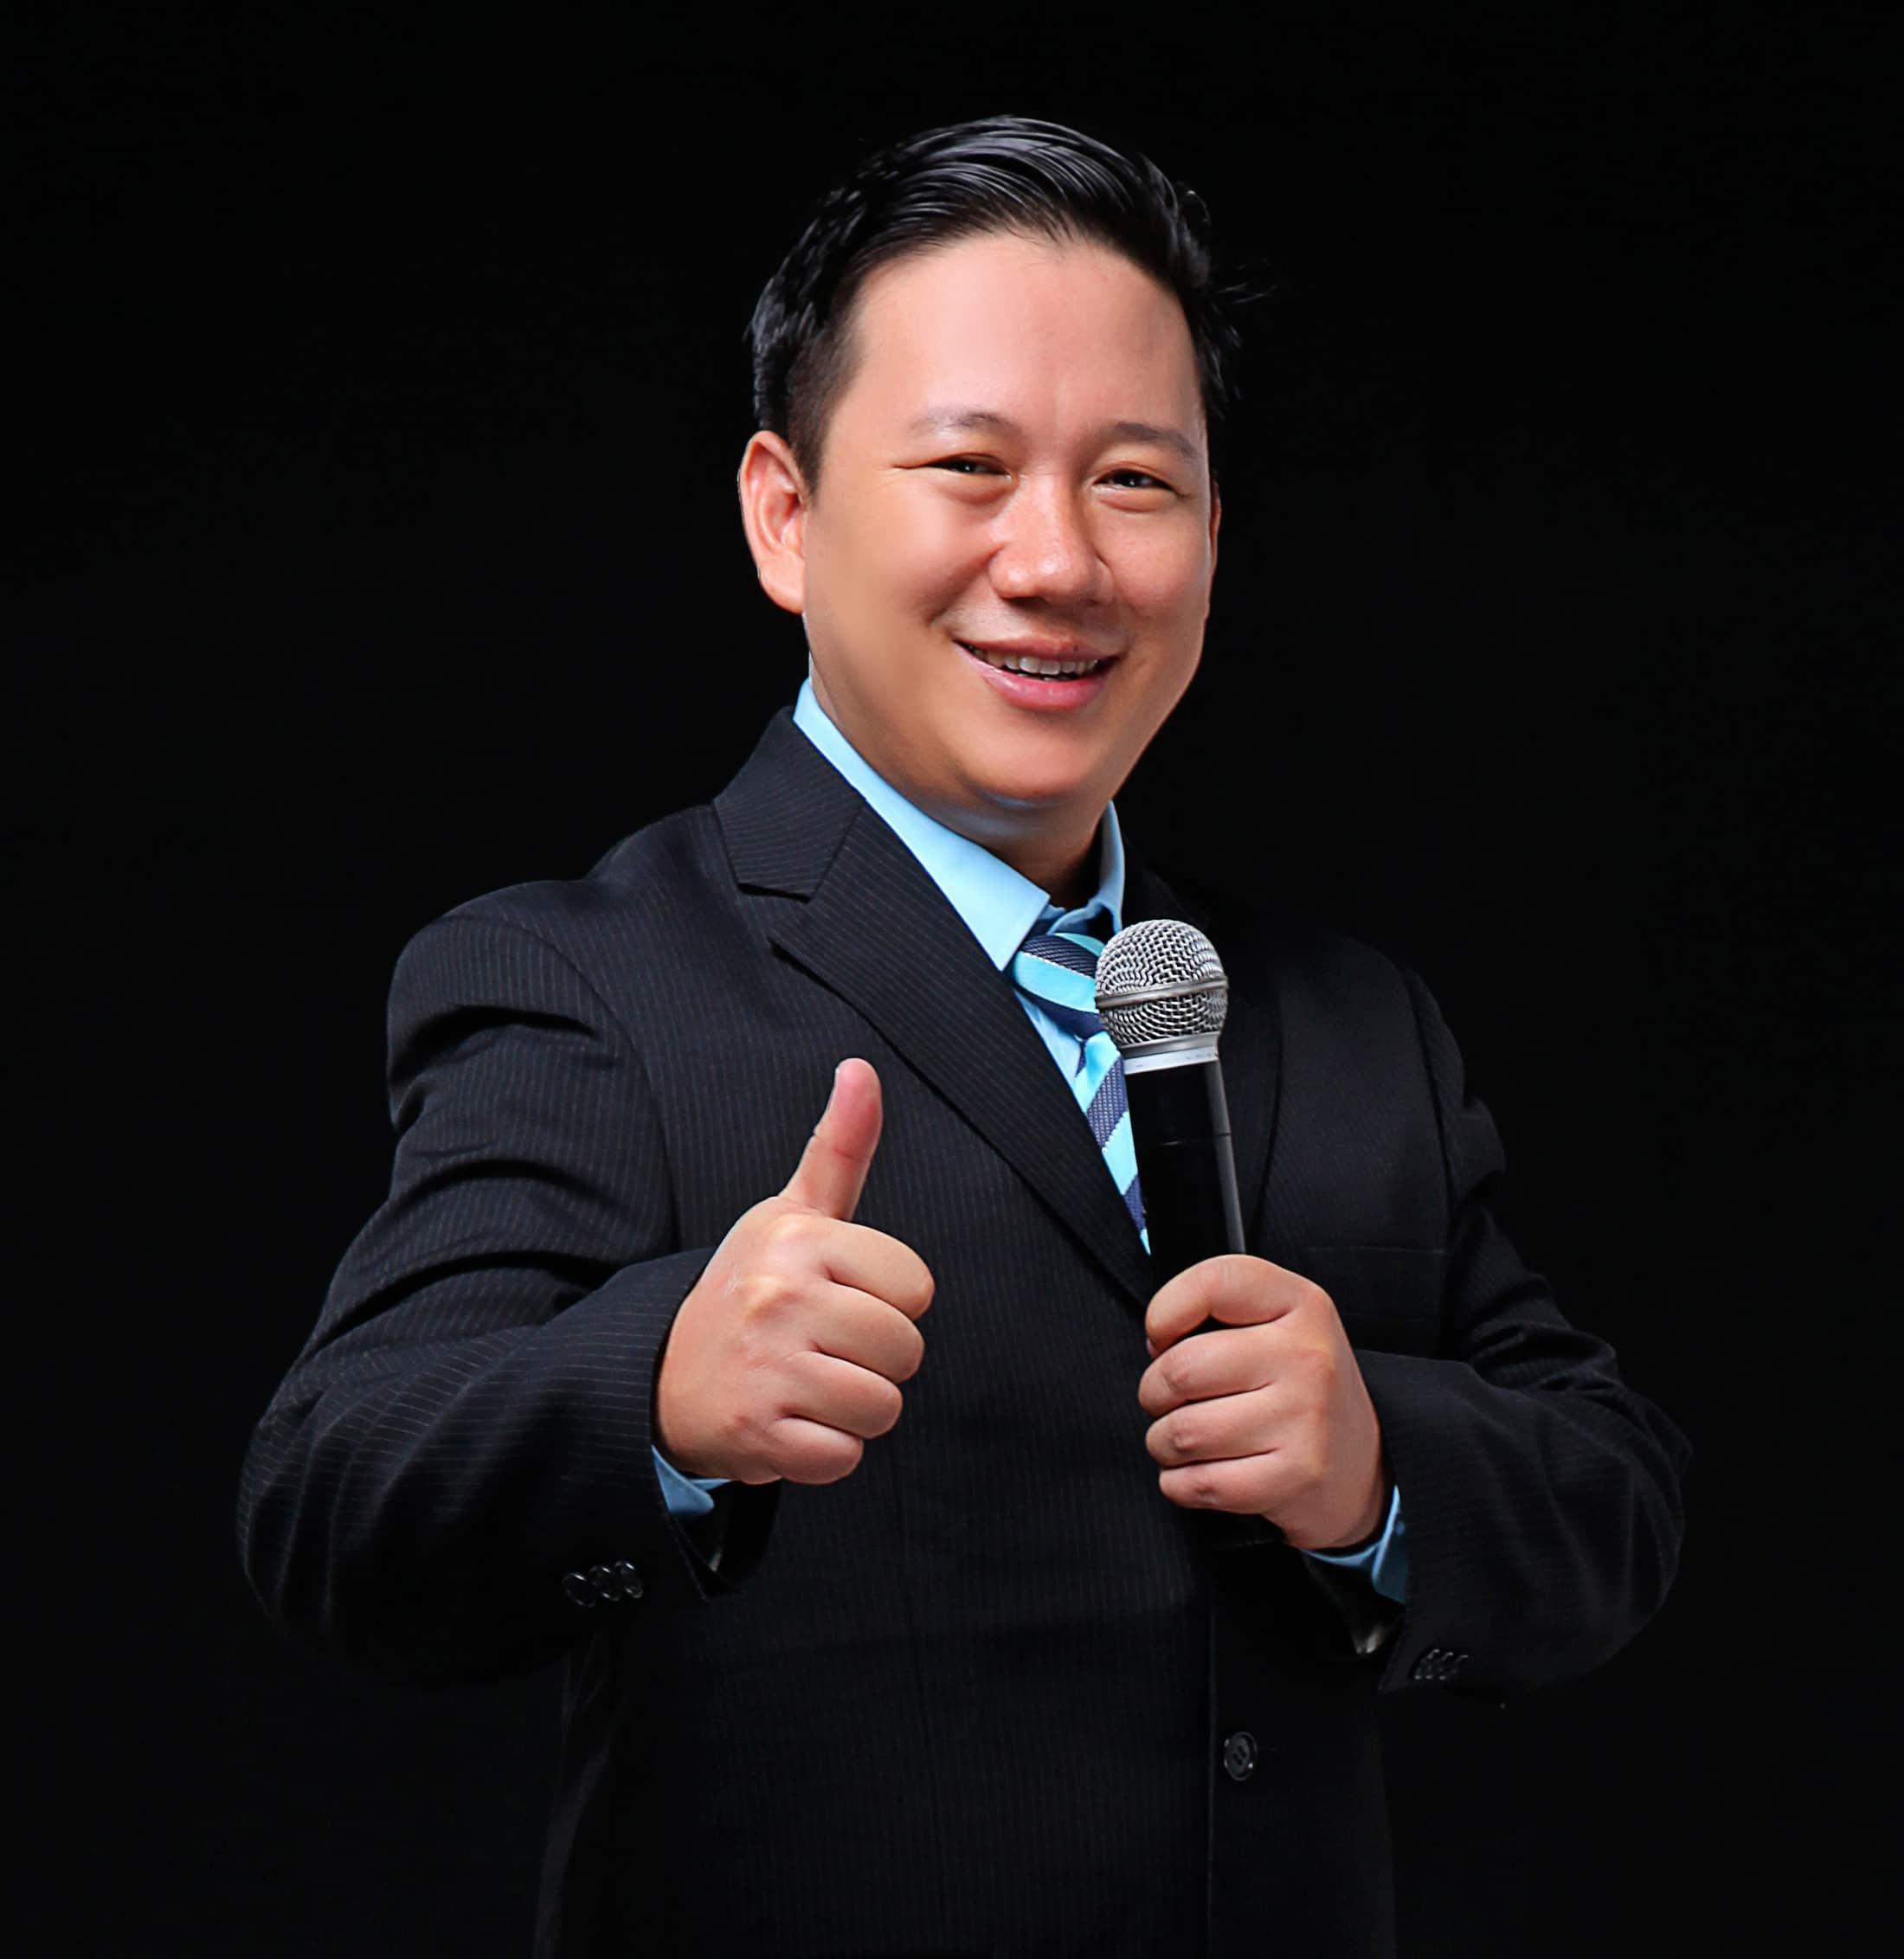 Johnny Kyaw Moe